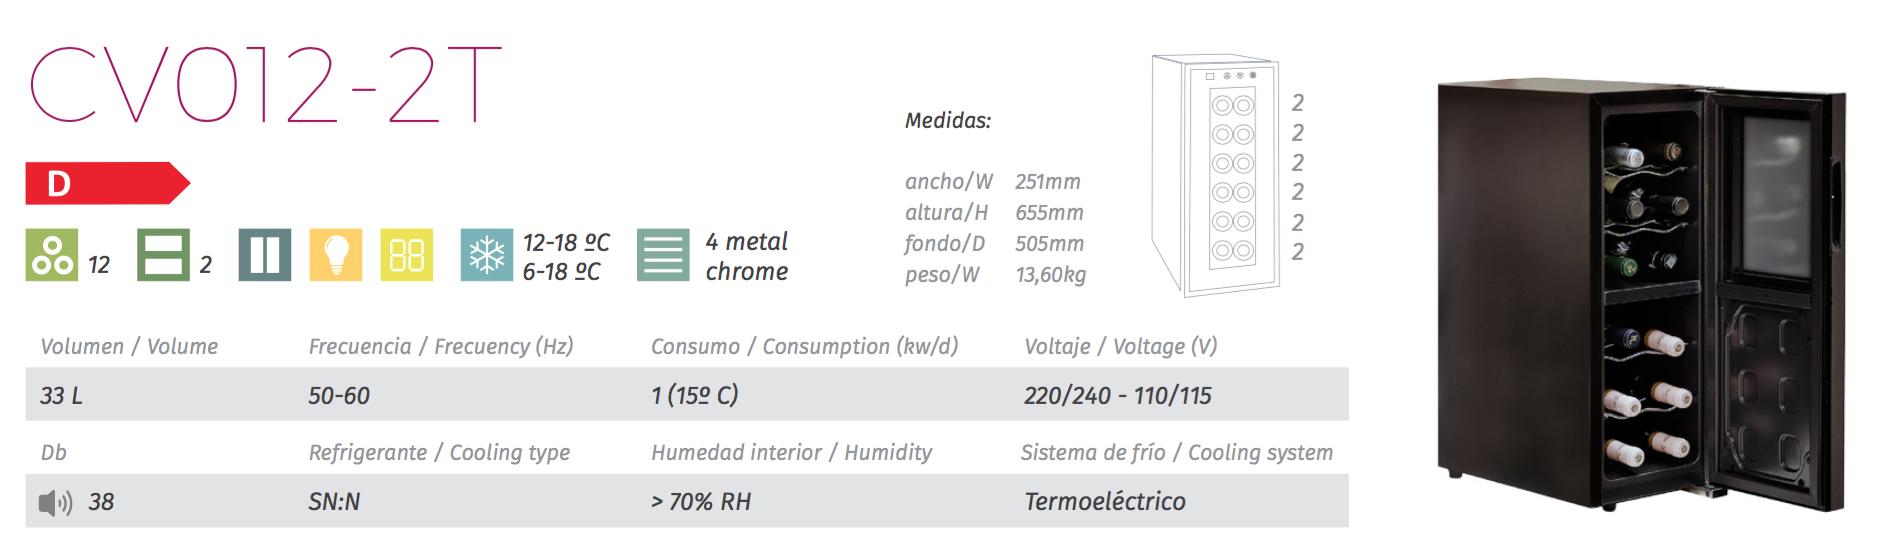 vinoteca cavanova CV012-2T tabla caracteristicas